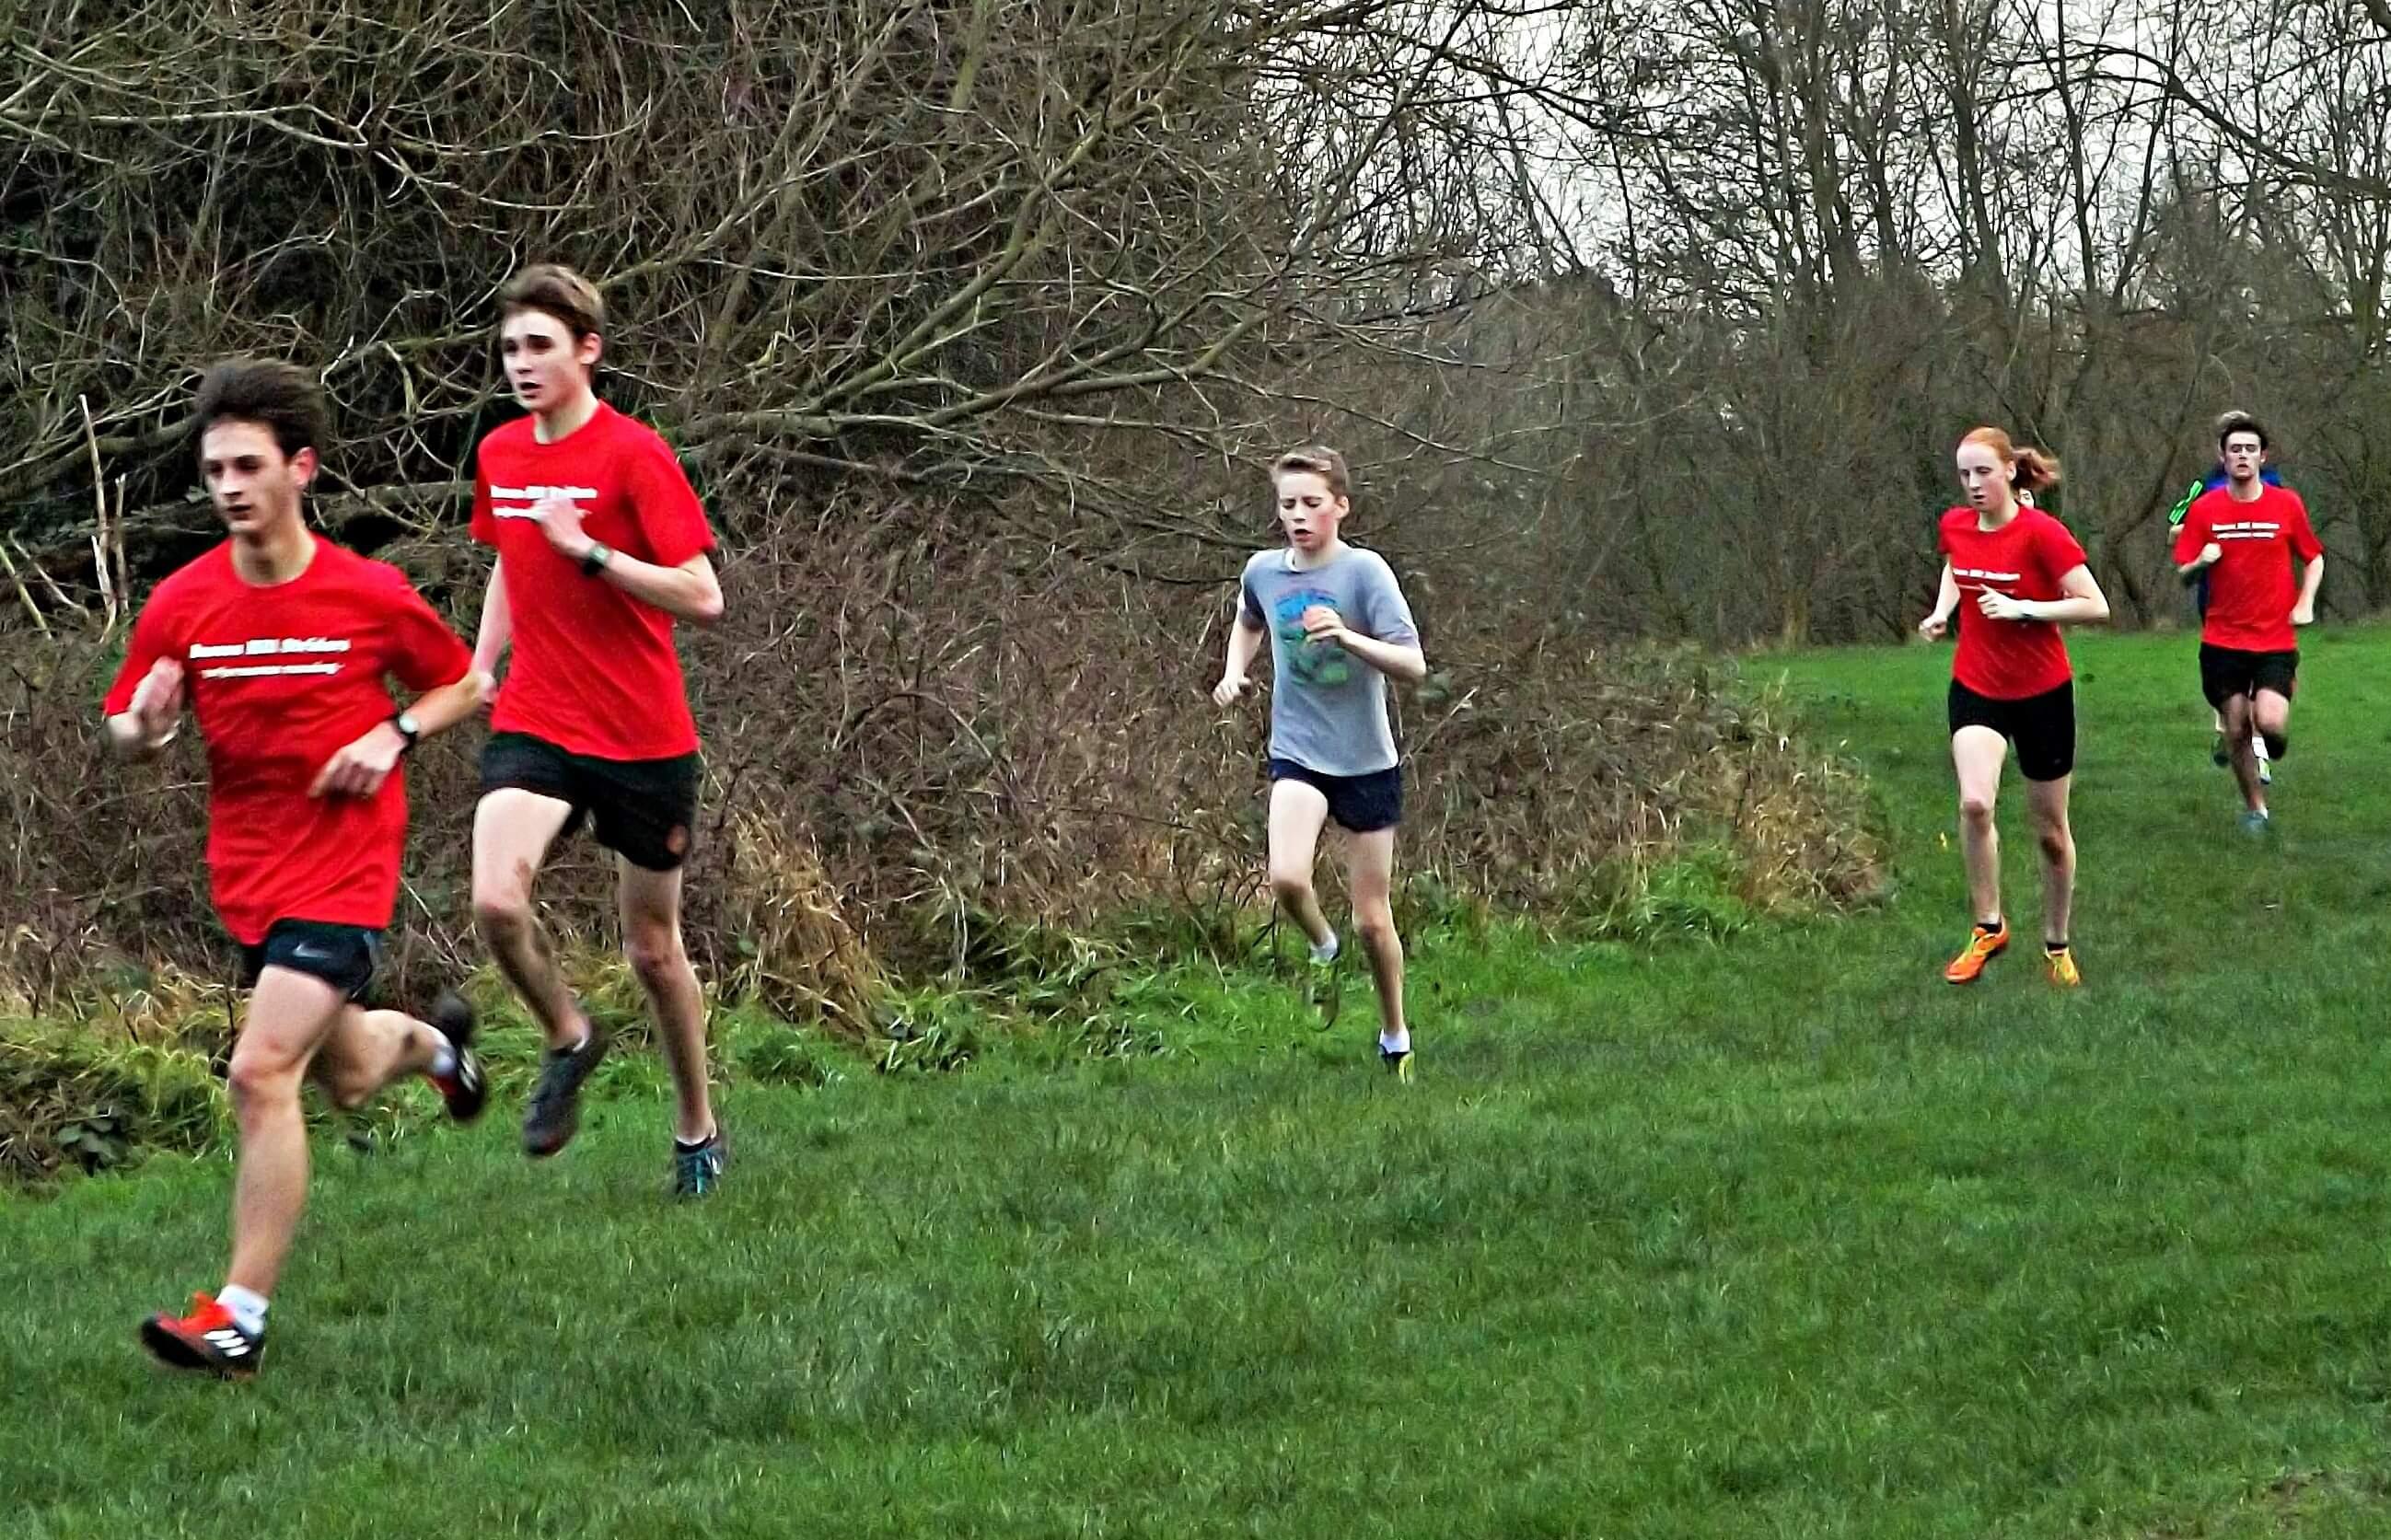 Training (January 2016): George, Hayden, Xavi, Alice, & Josh